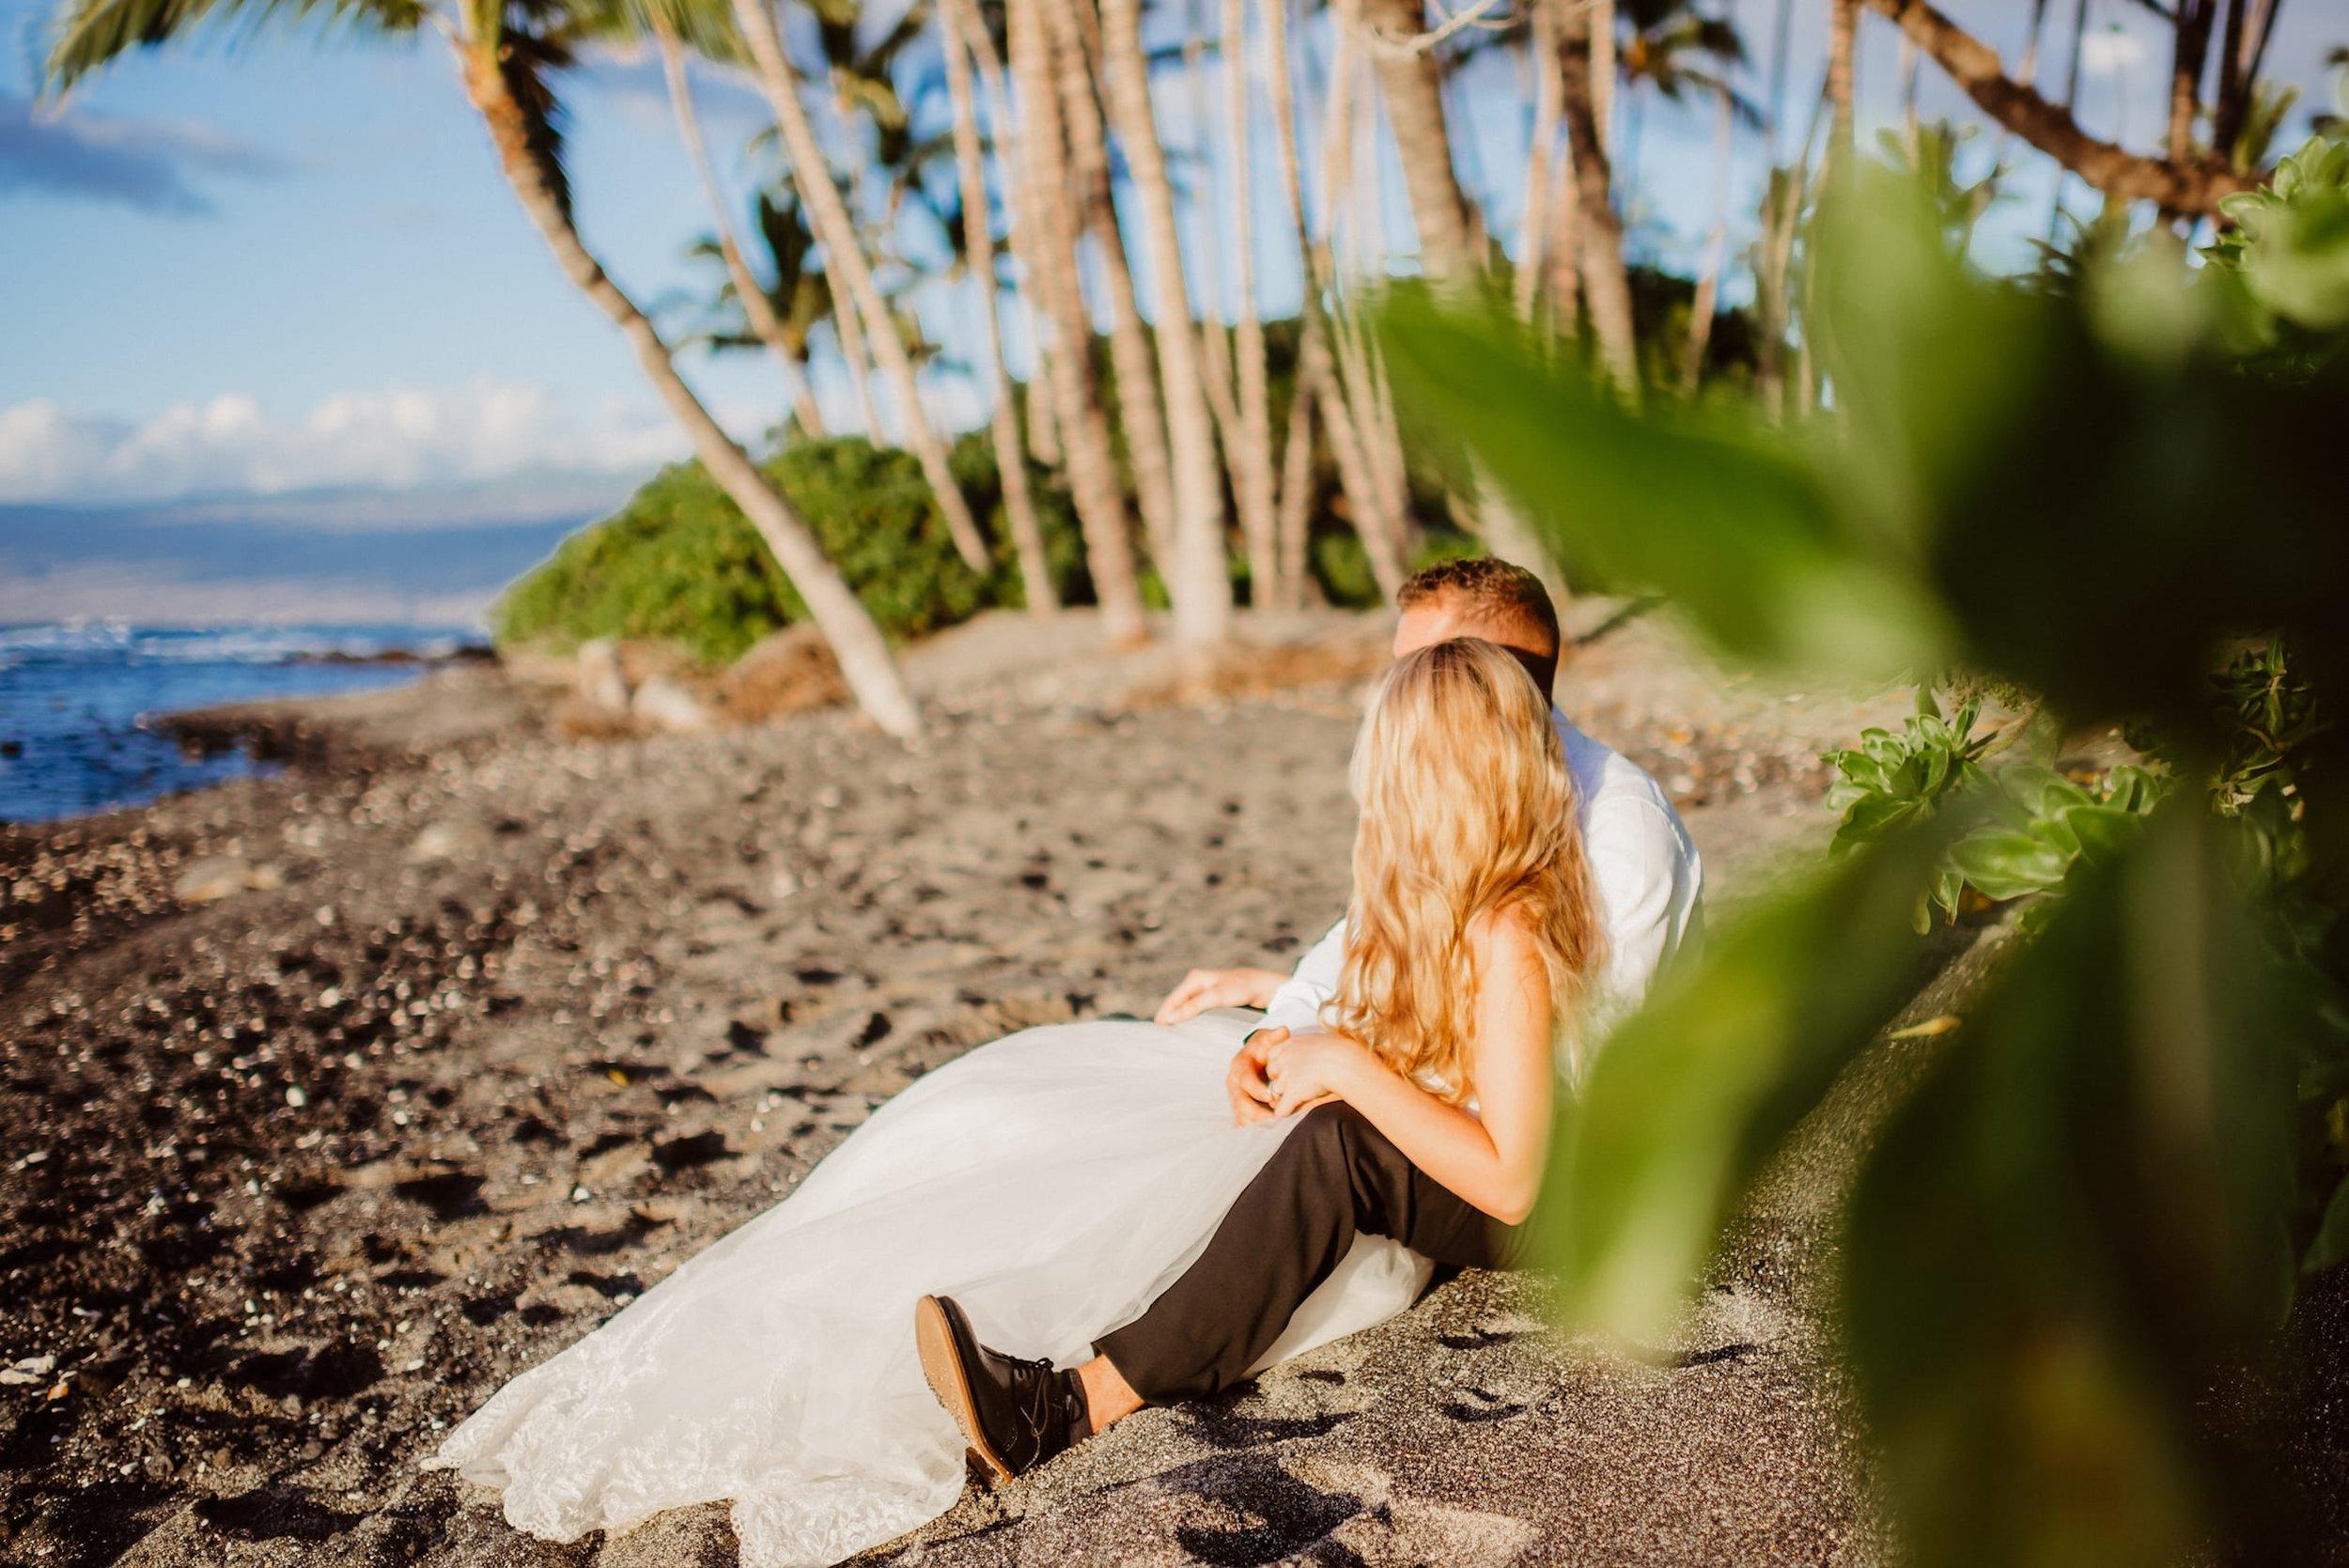 Big-Island-Elopement-Private-Wedding-Hawaii-Beach-05.jpg